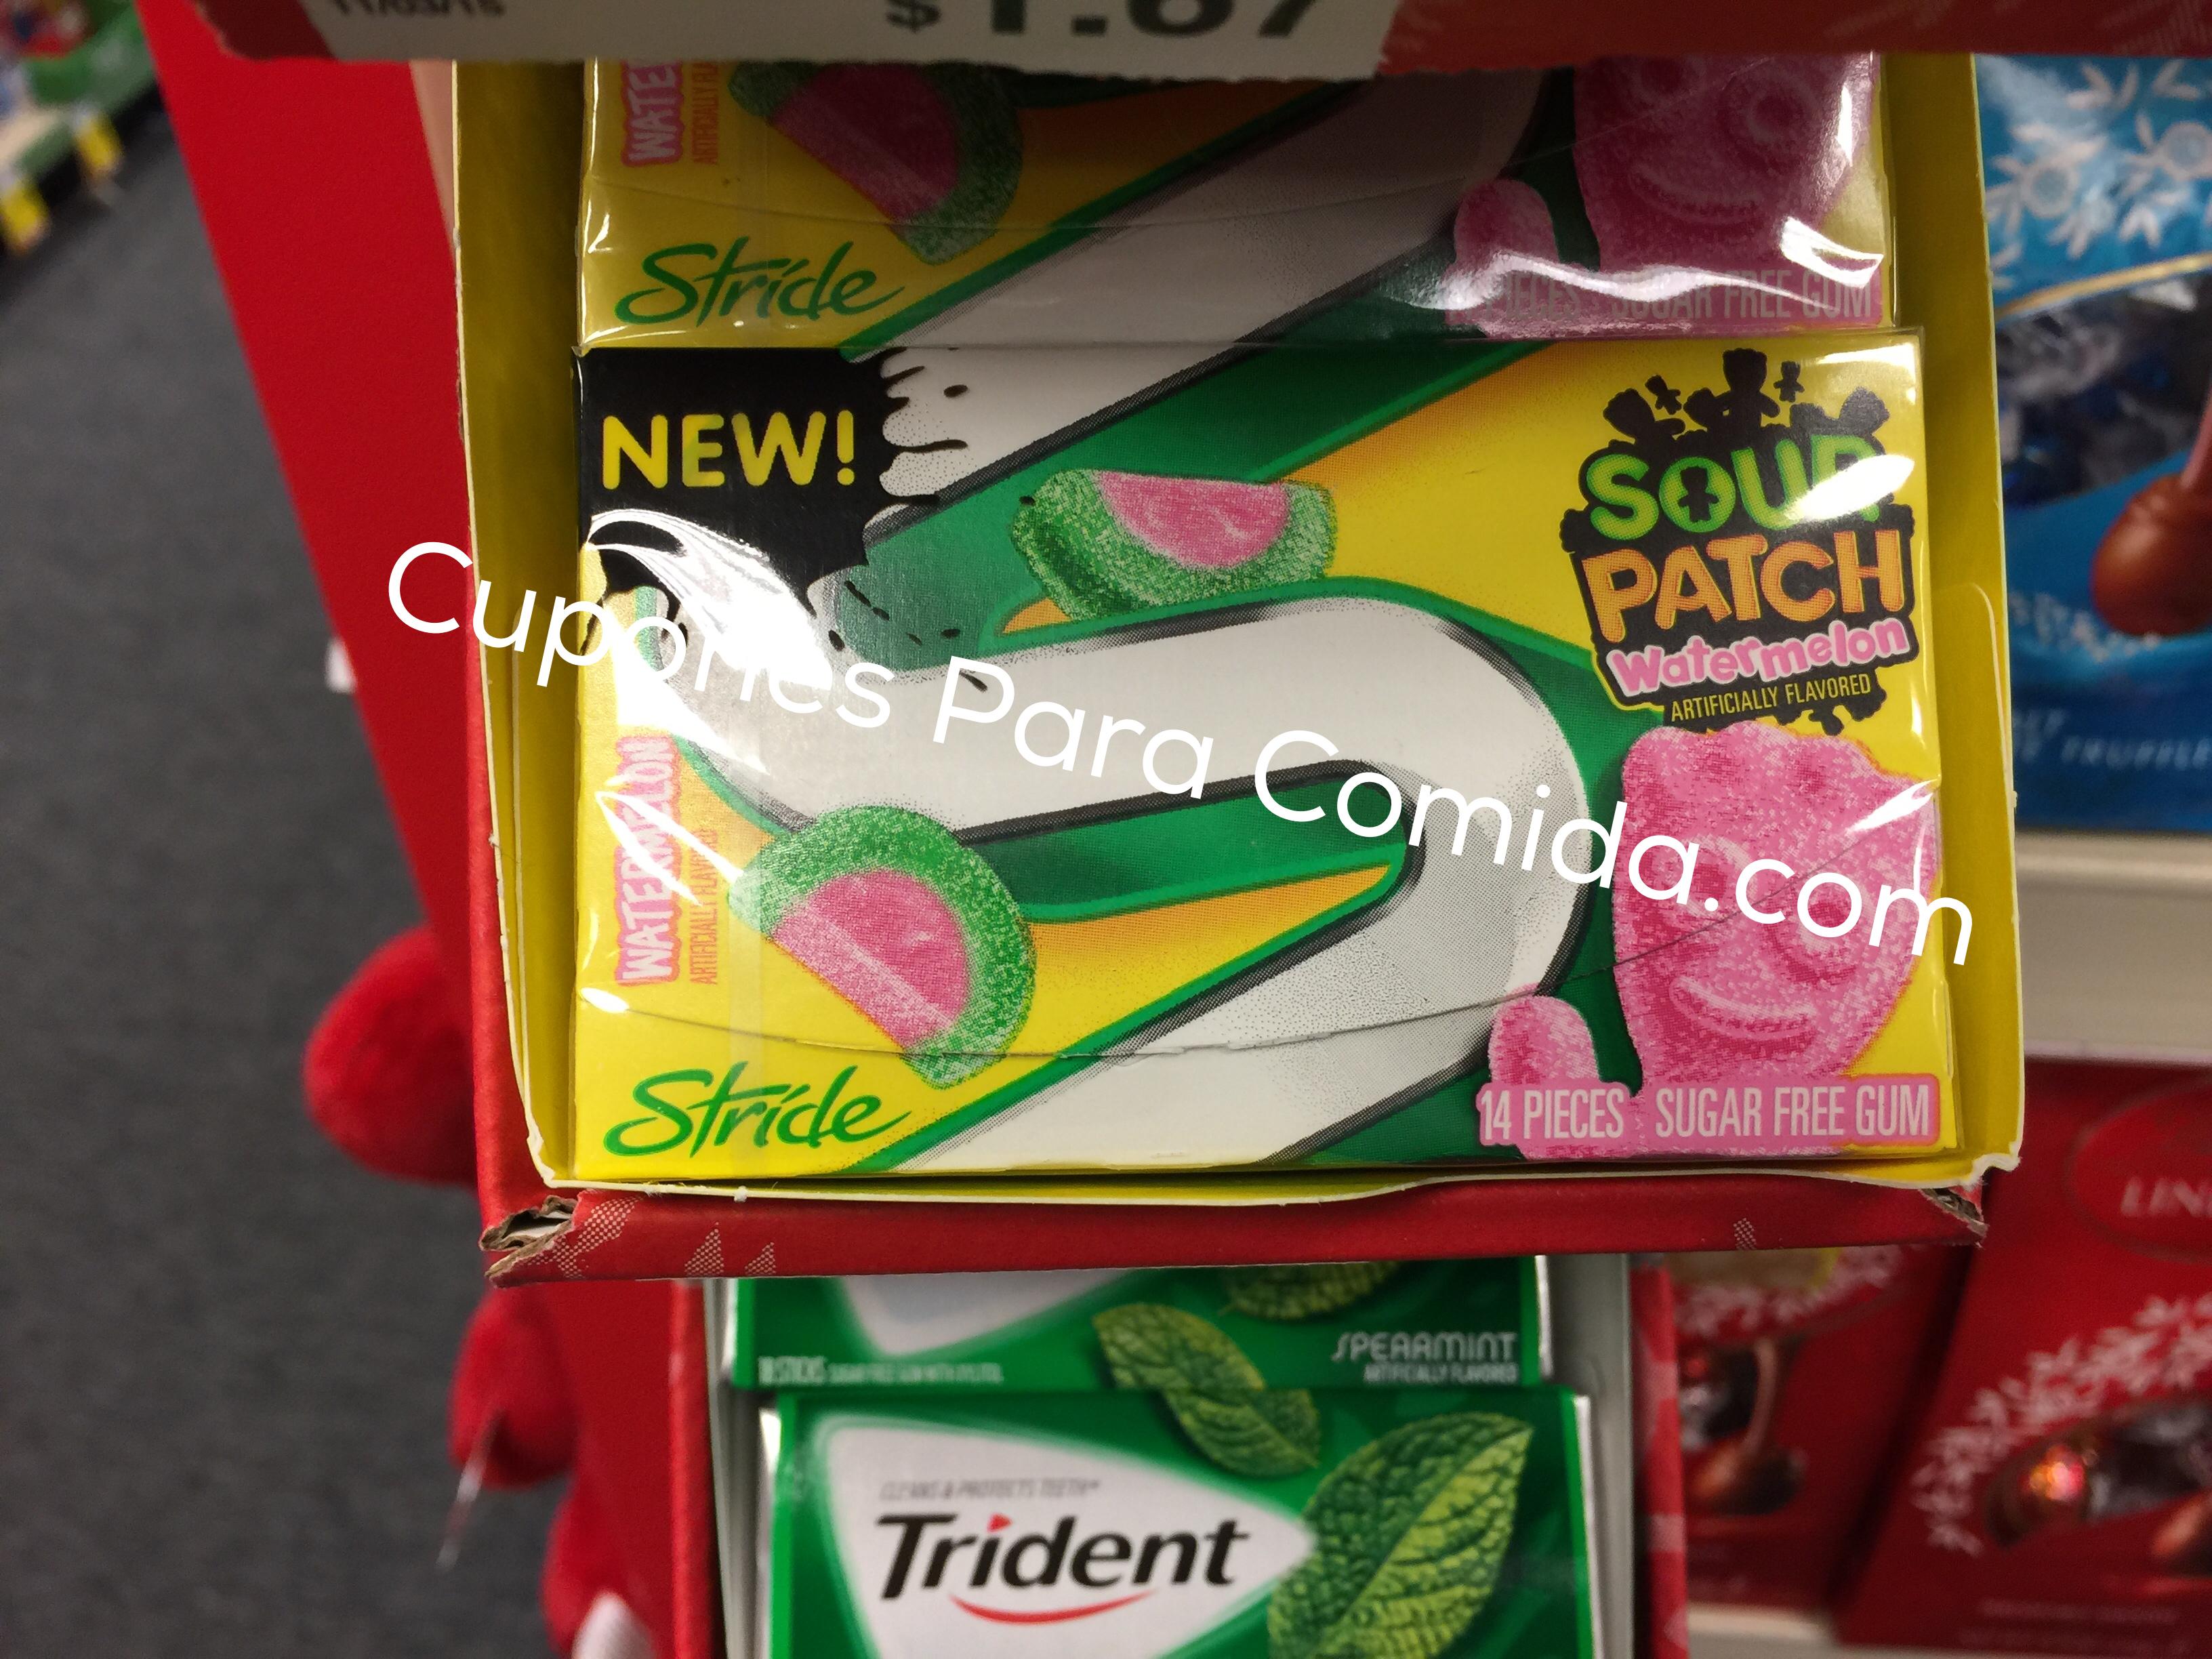 Cvs viagra single packs